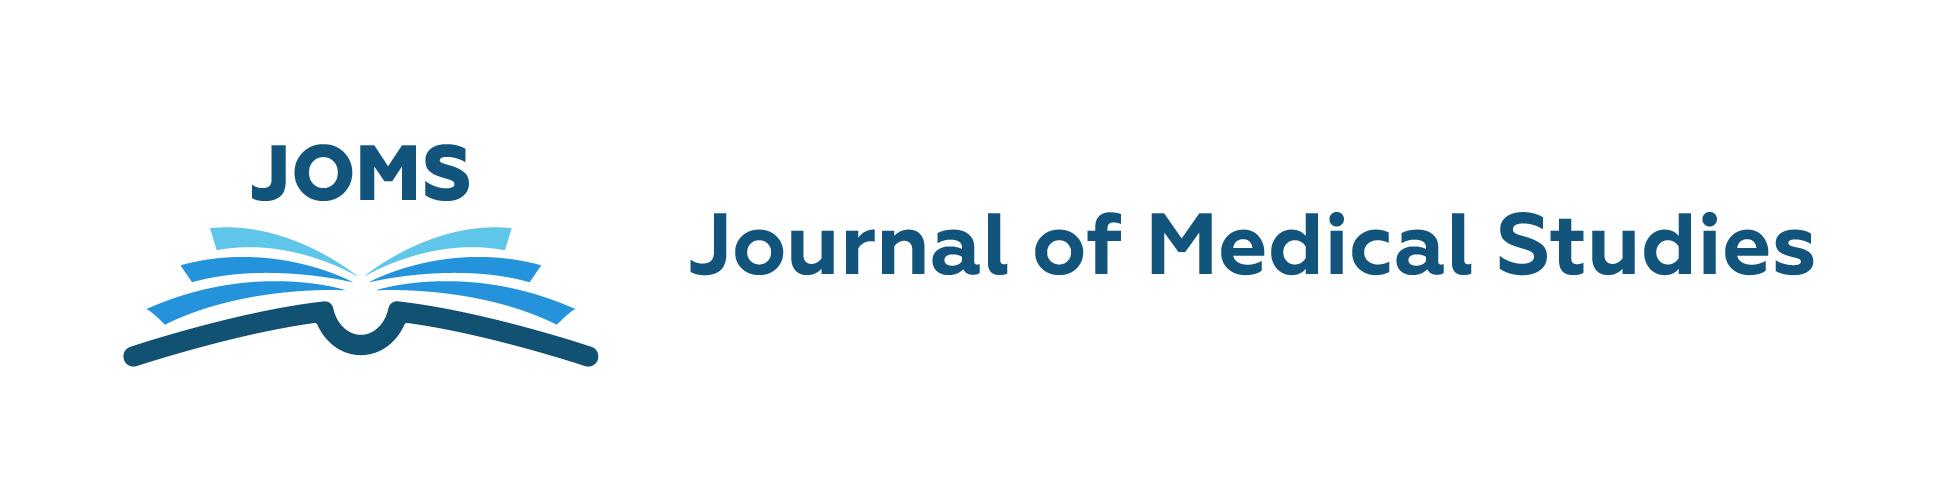 Journal of Medical Studies